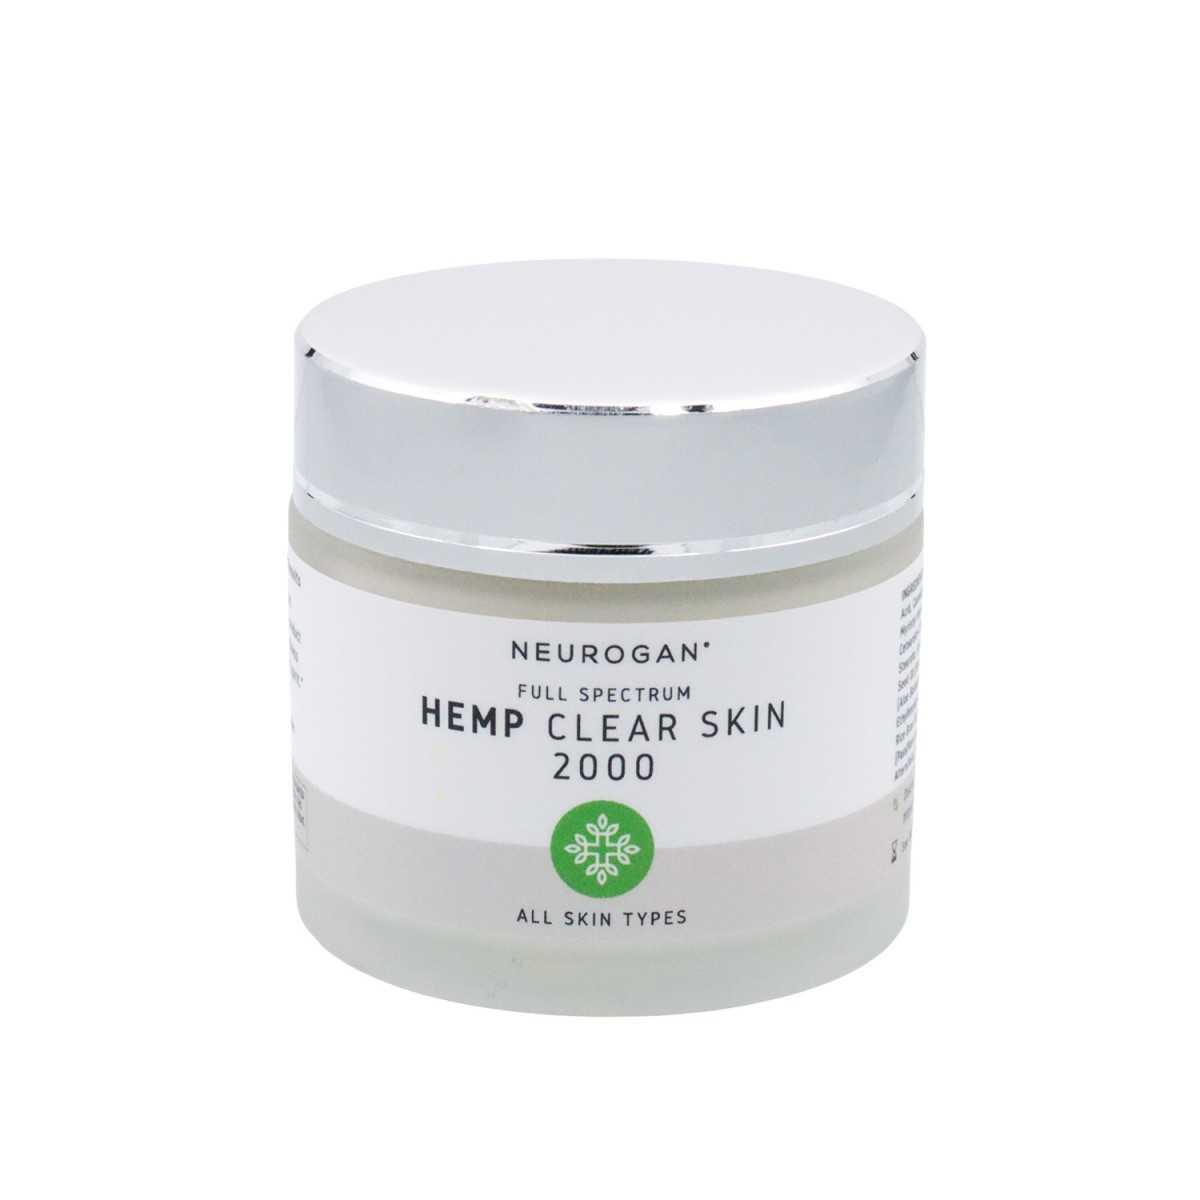 Neurogan Hemp Clear Skin Cream 2000mg